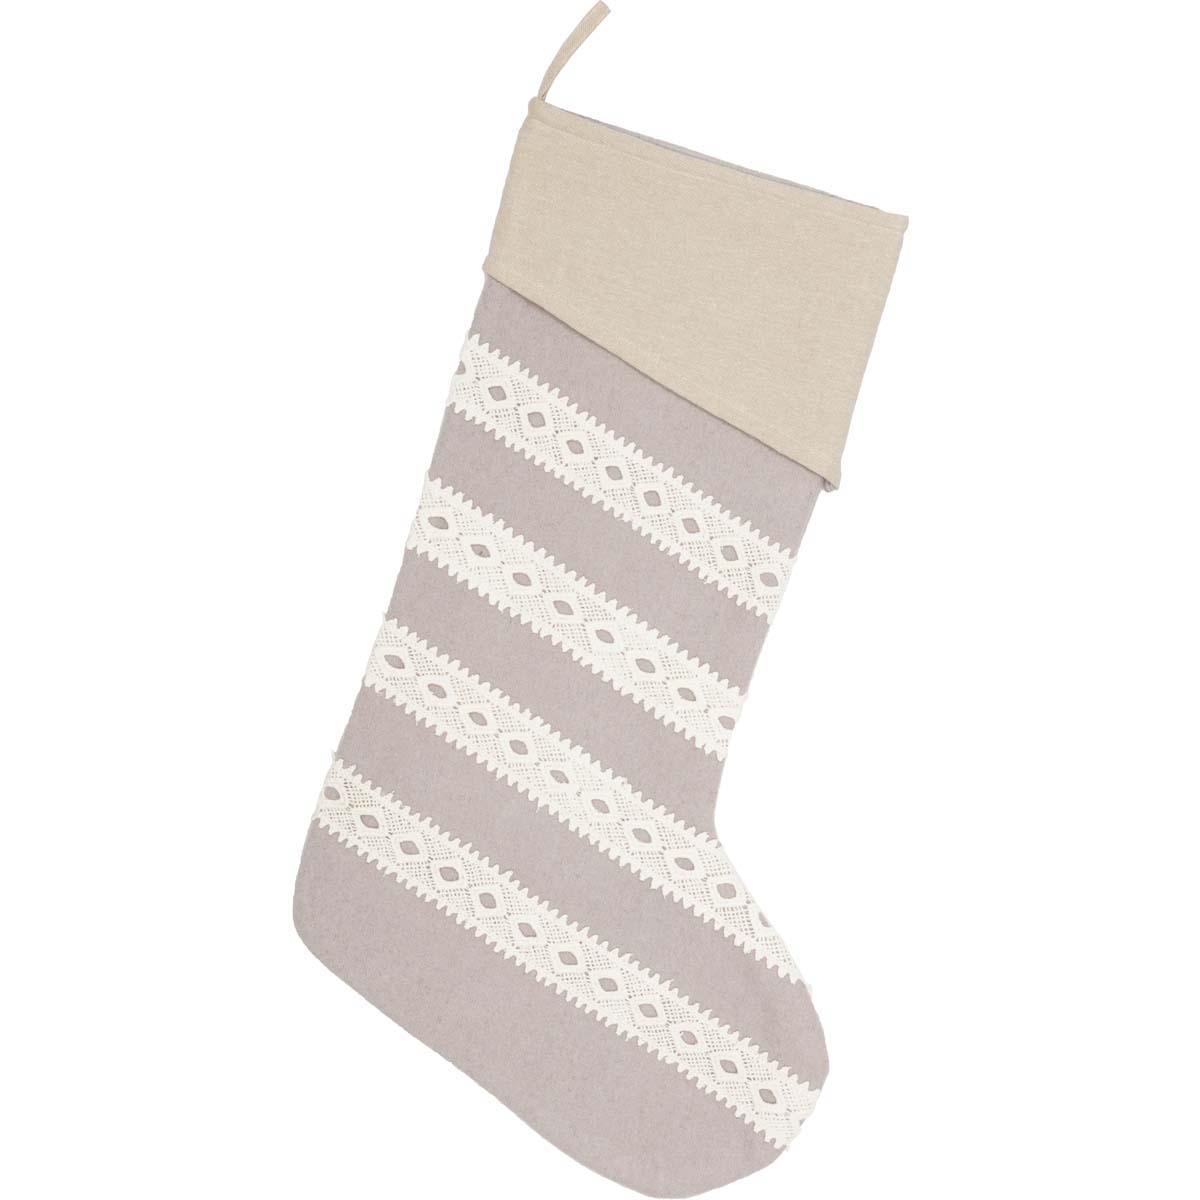 Margot Grey Stocking 12x20